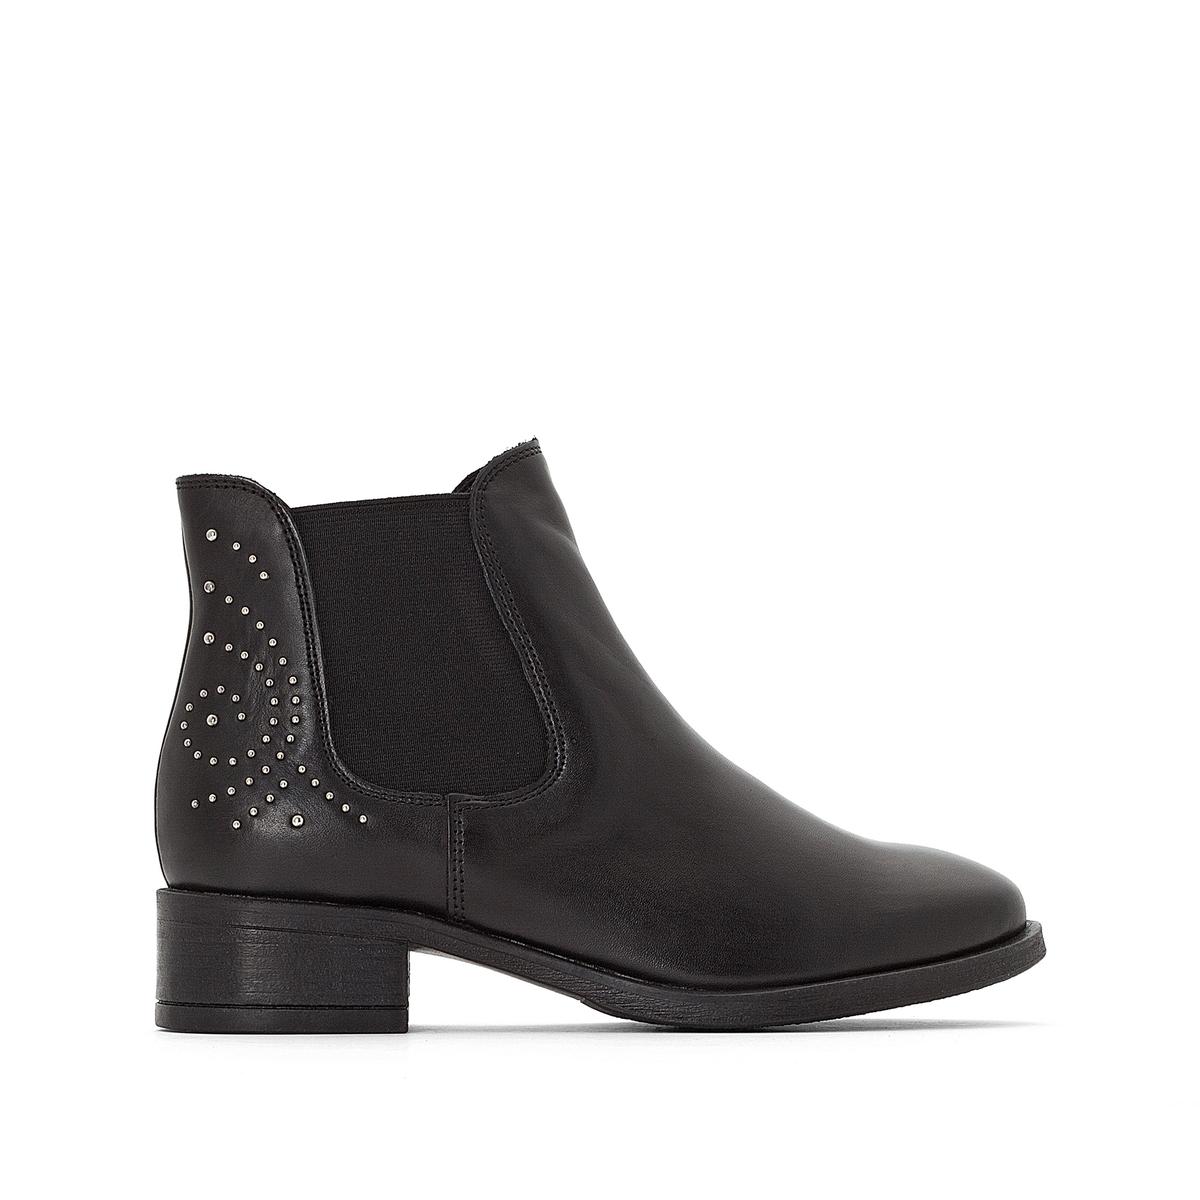 Ботинки кожаные Sasha sasha mannheim